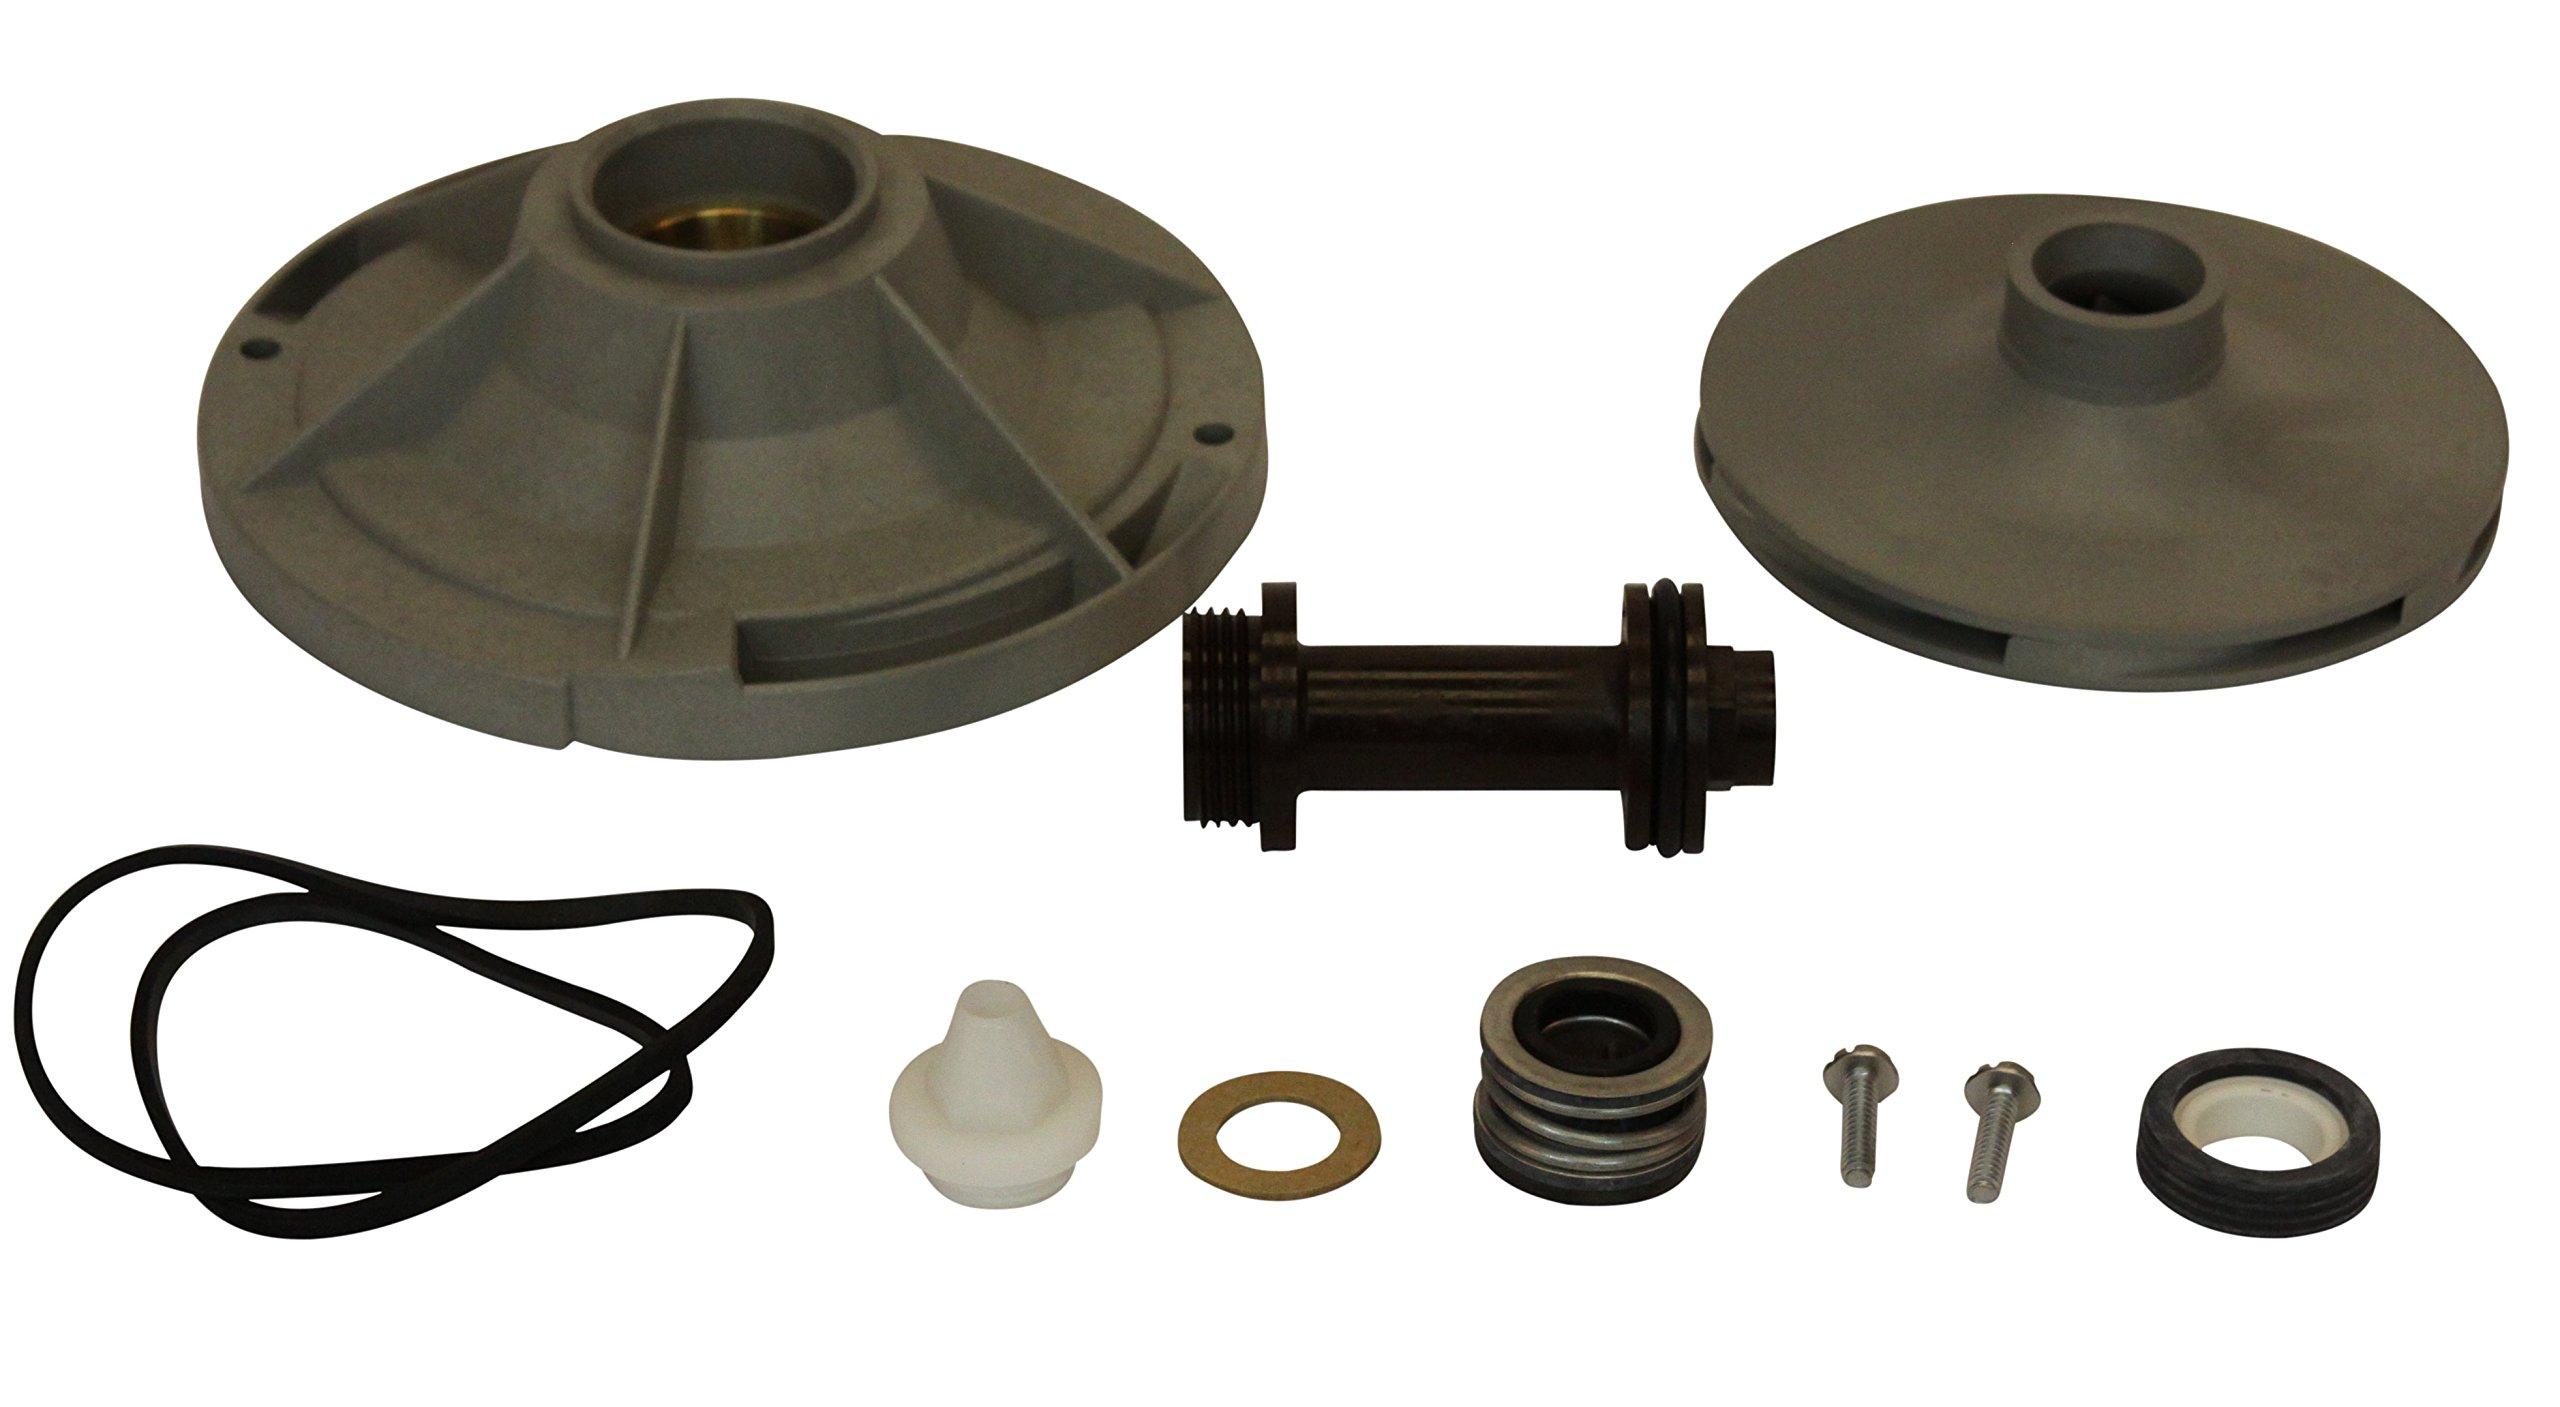 Wayne 64044-WYN1 SWS75 Replacement Parts Kit, Black by Wayne